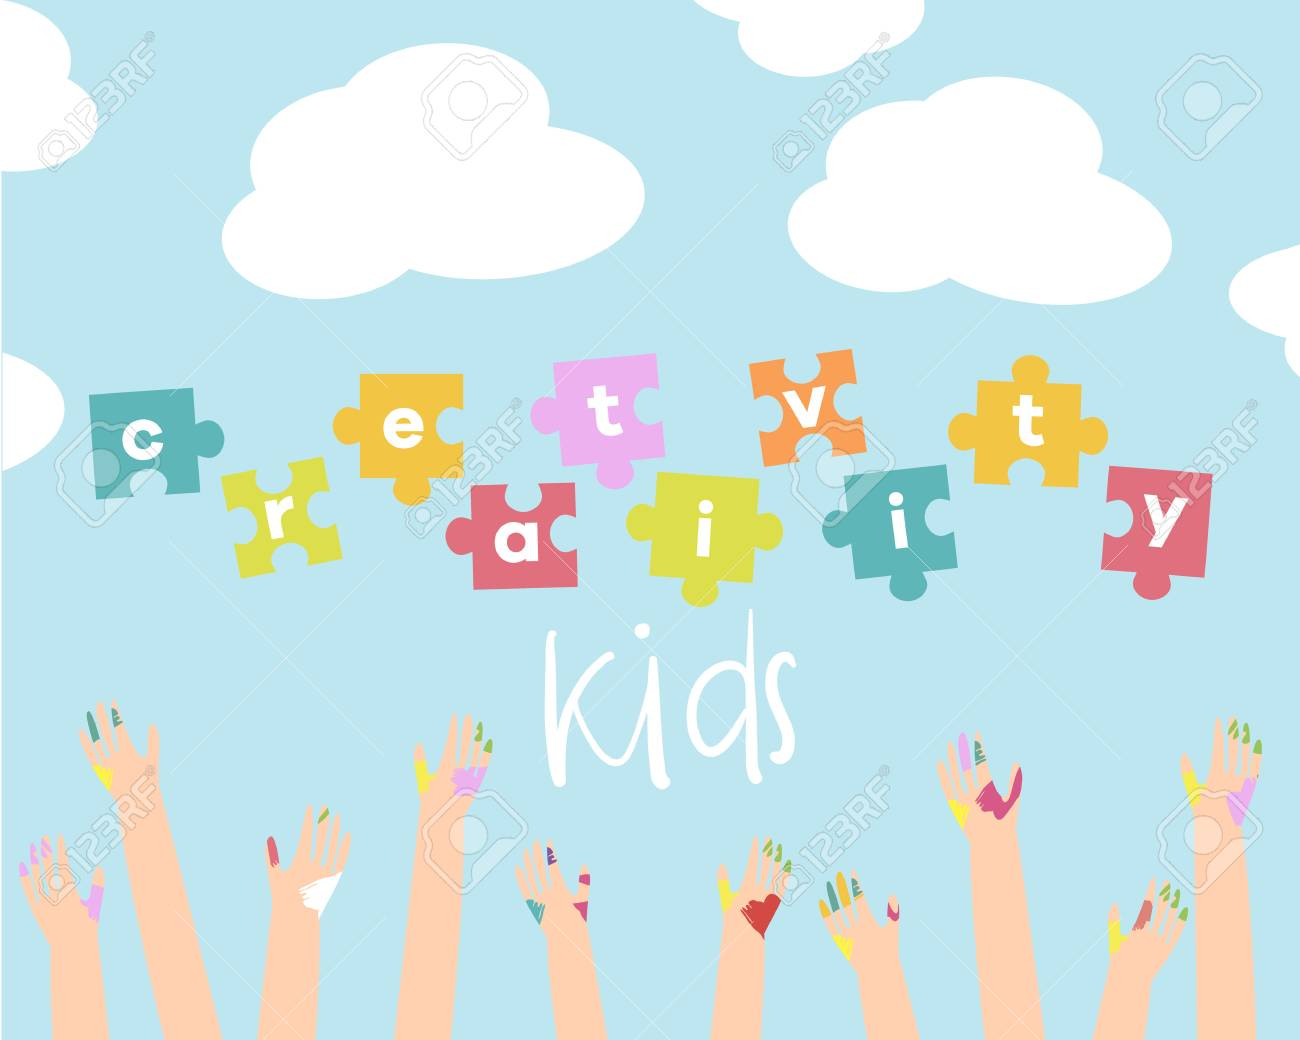 Kids Creativity Vector Illustration Background Banner Flyer For Art Lessons Or